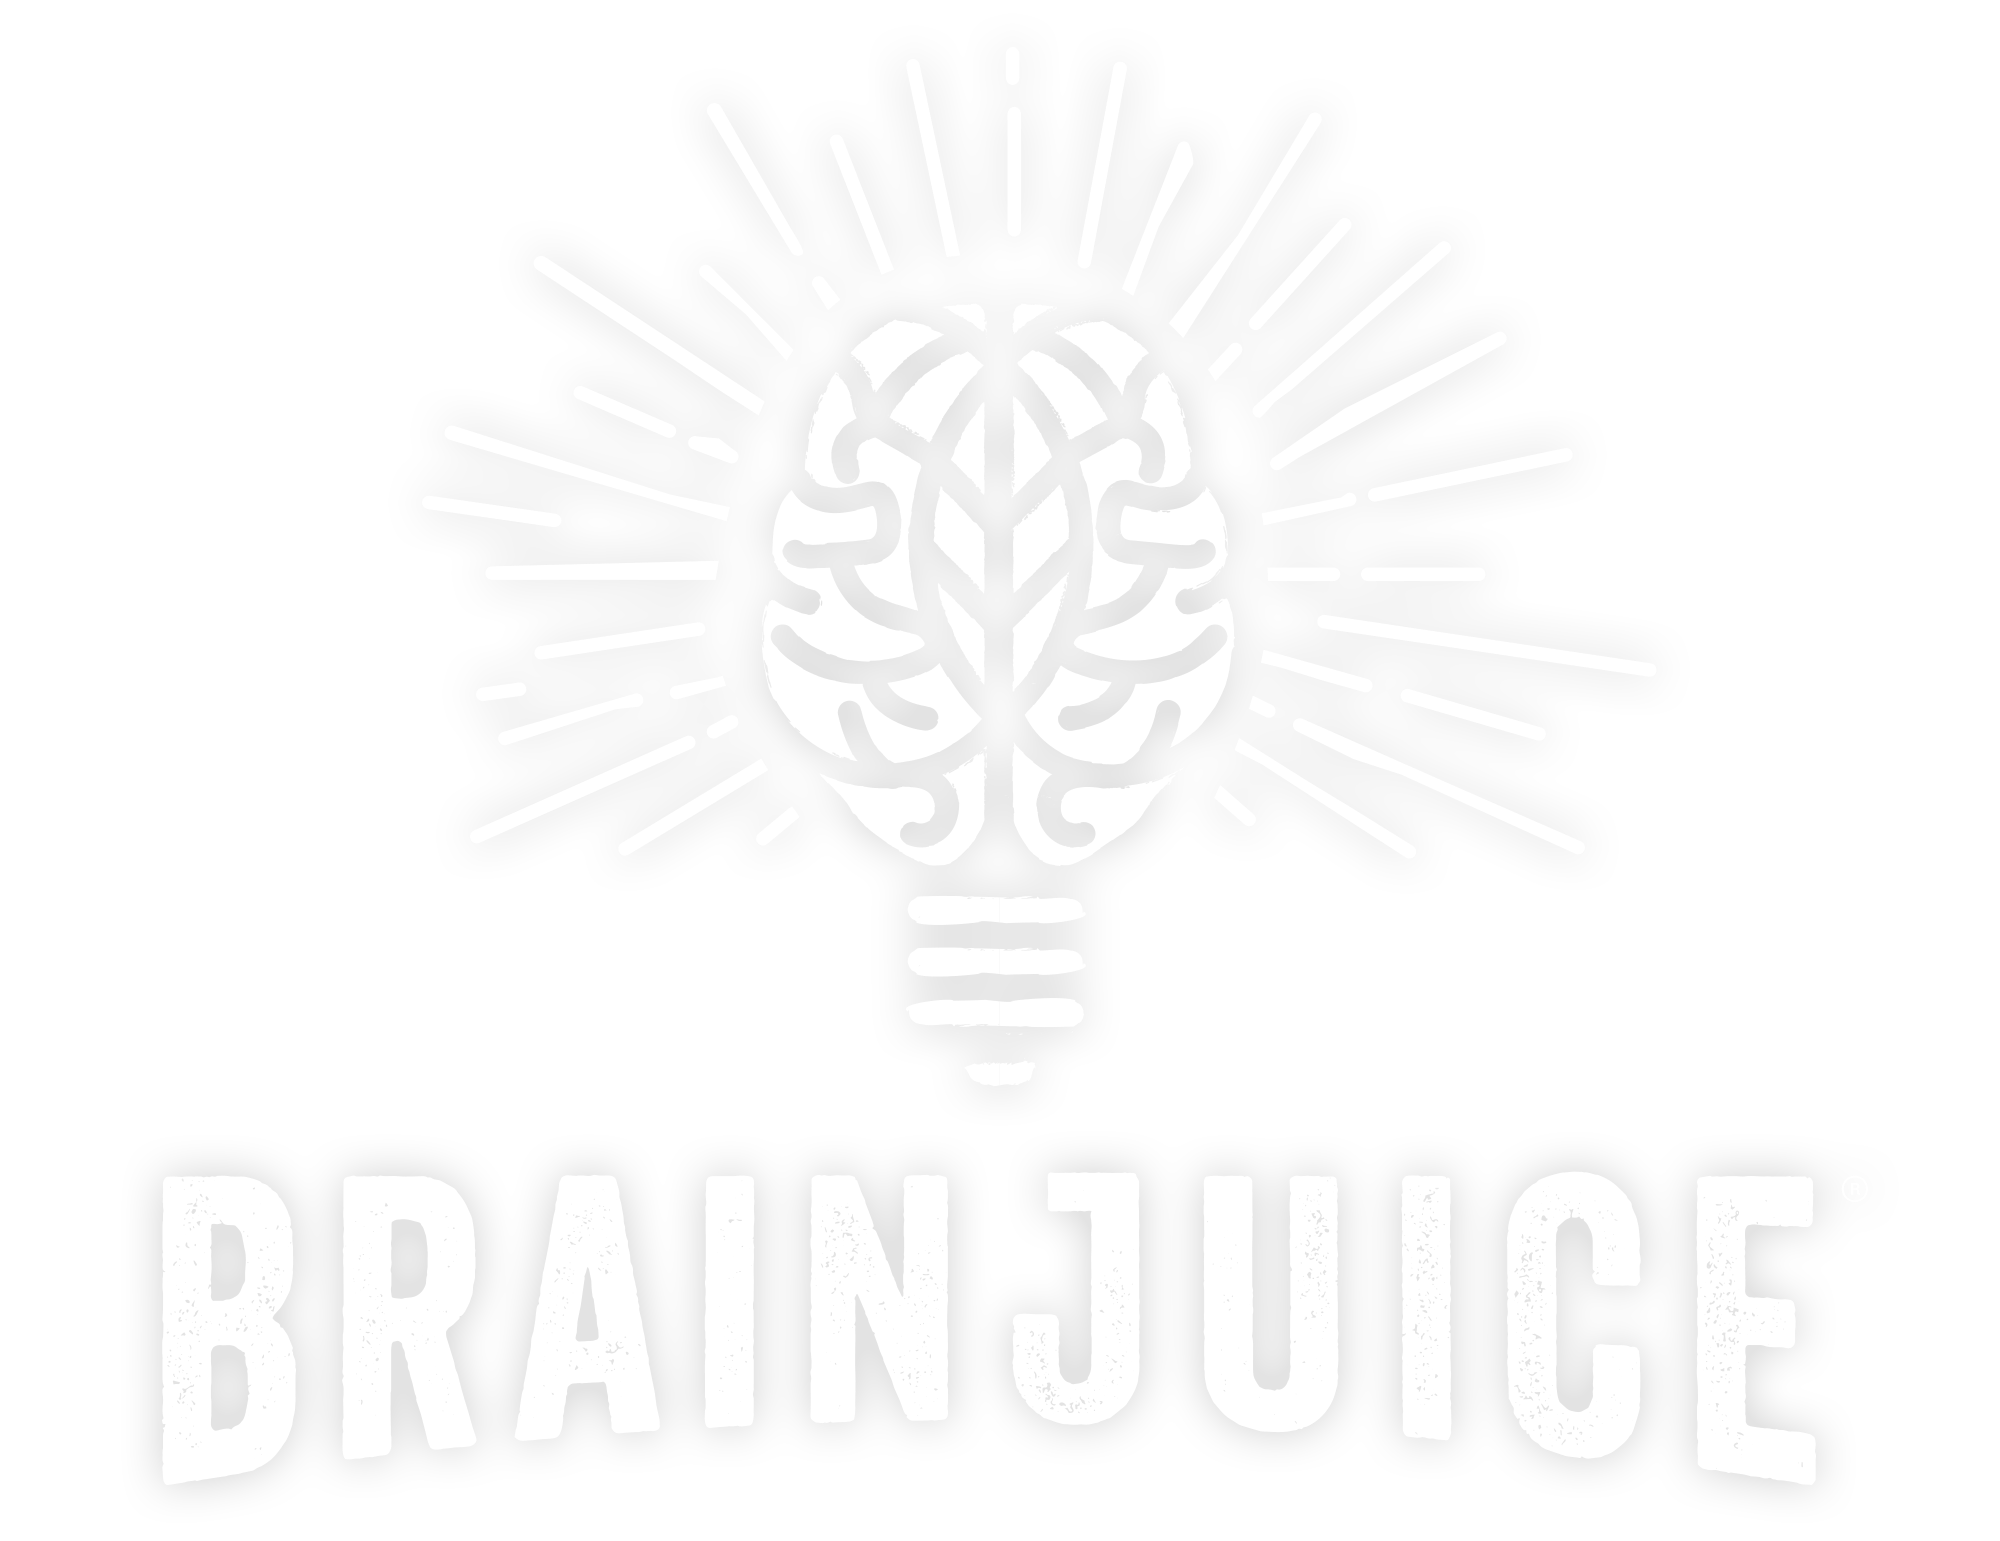 Gallant_BrainJuice_logo_white.png